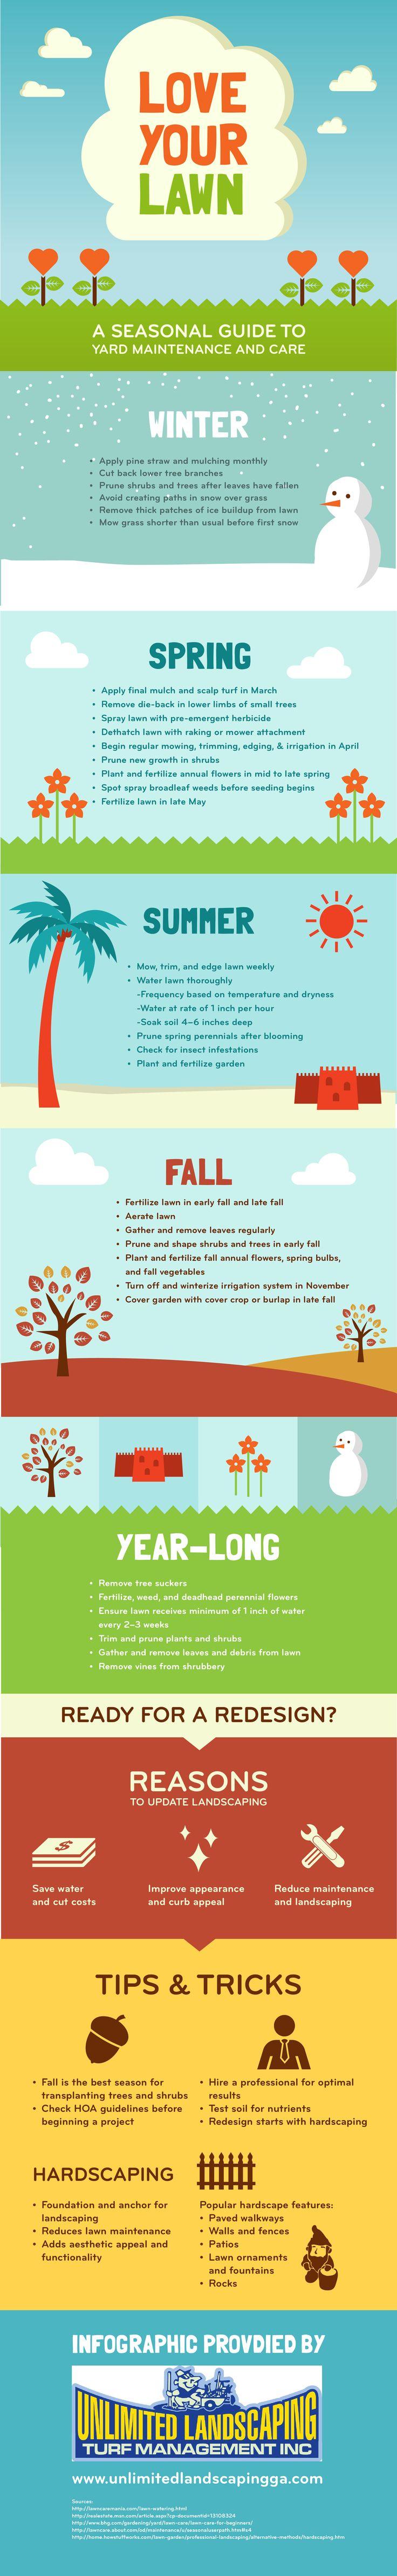 25 Best Ideas About Lawn Service On Pinterest Lawn Care